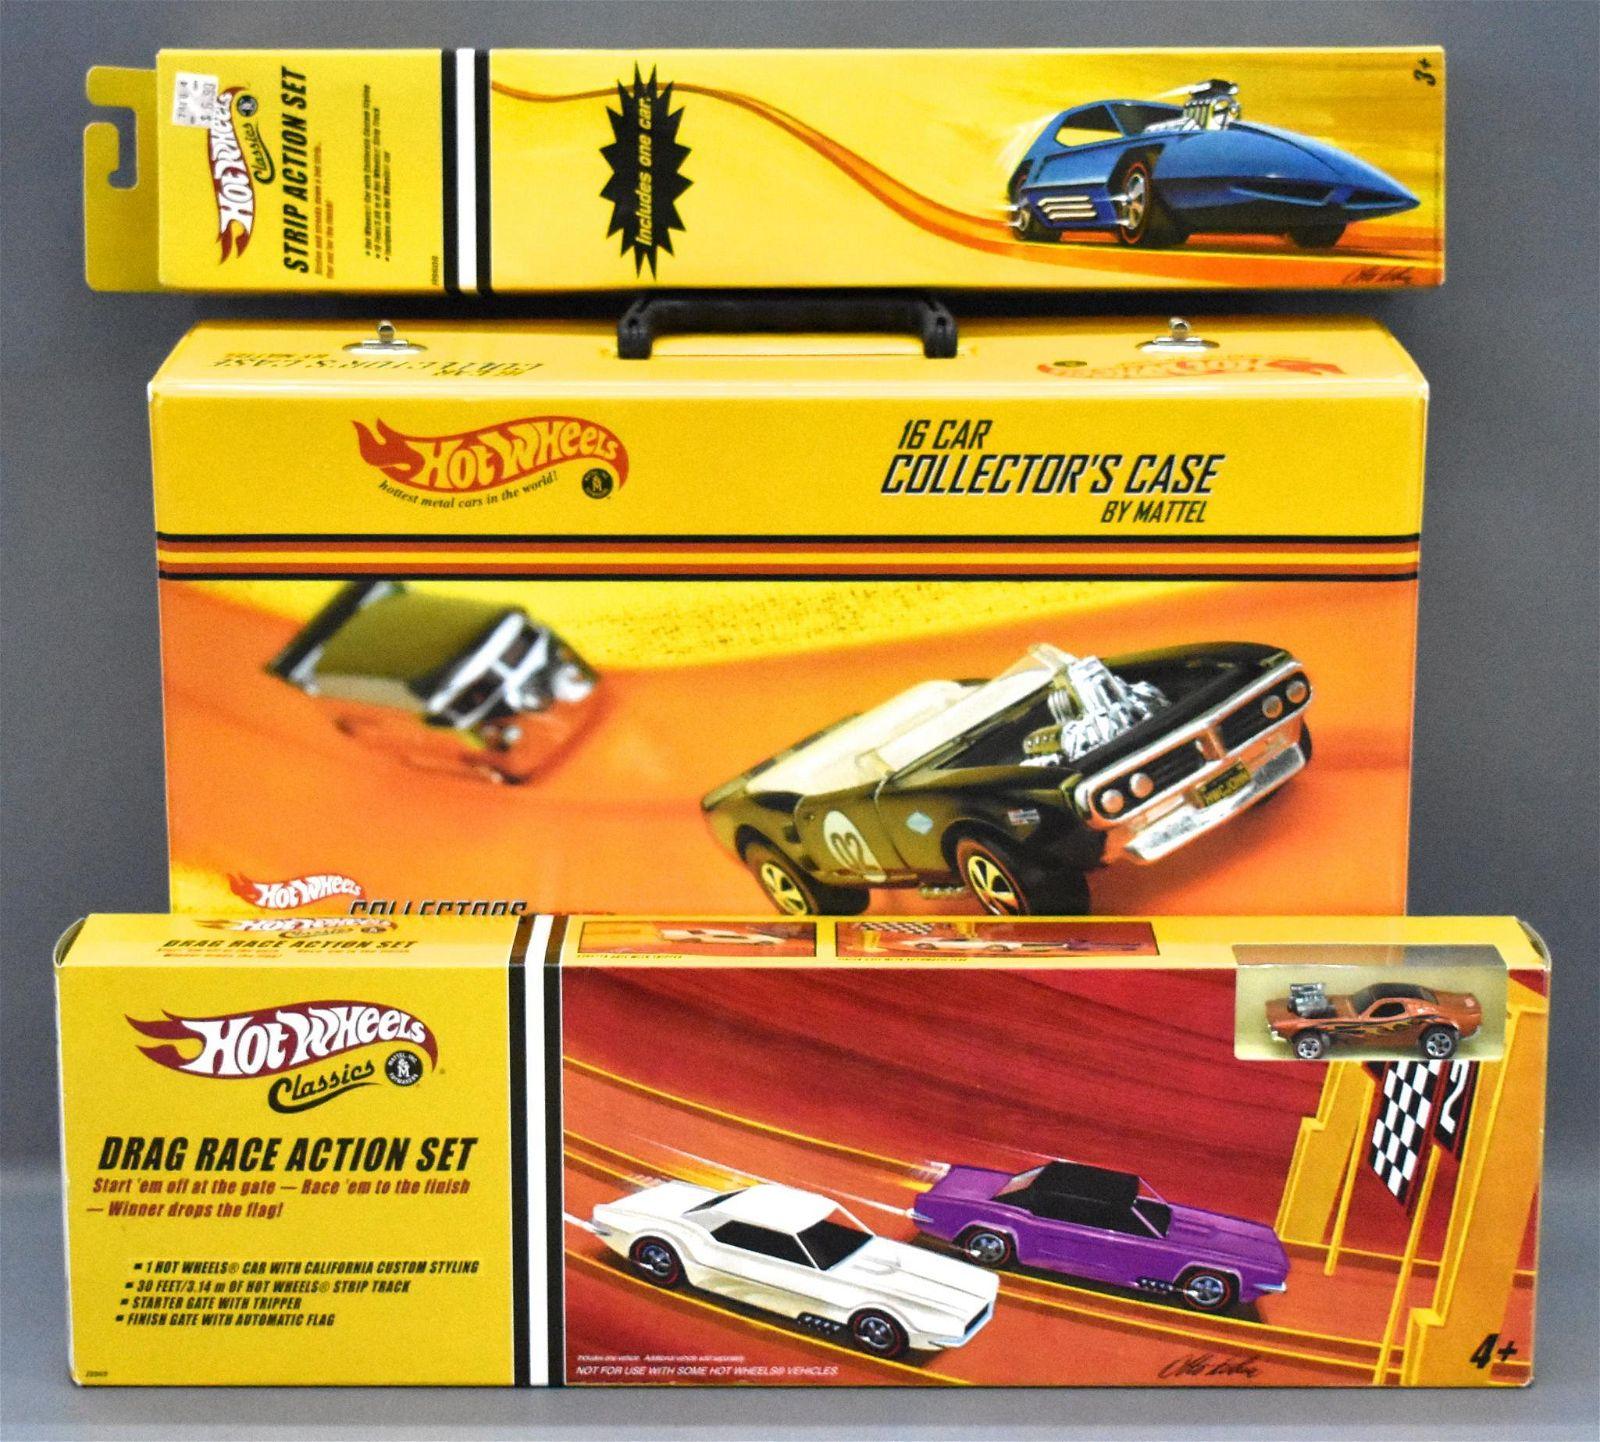 Hot Wheels Classics collectors case plus two factory